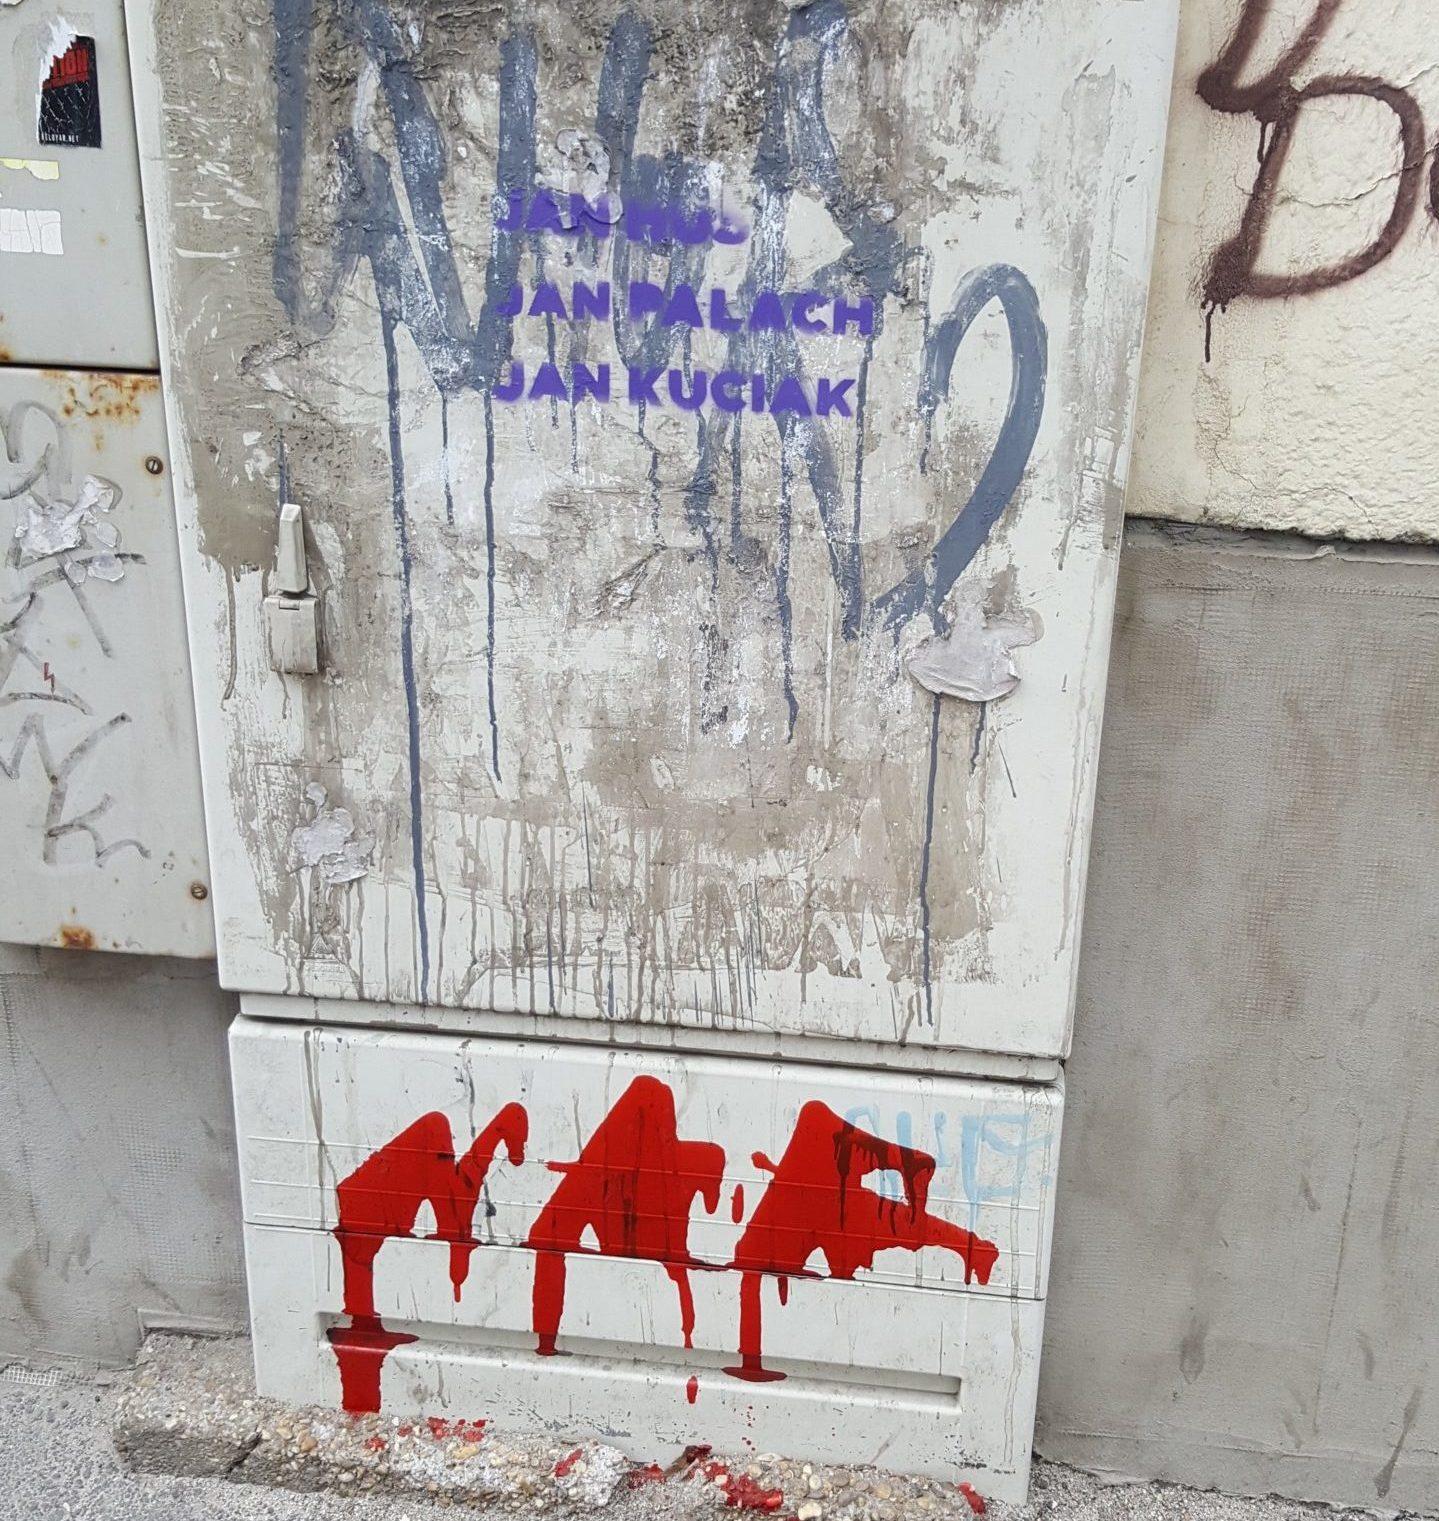 Photograph of graffiti memorializing assassinated investigative journalist Ján Kuciak.